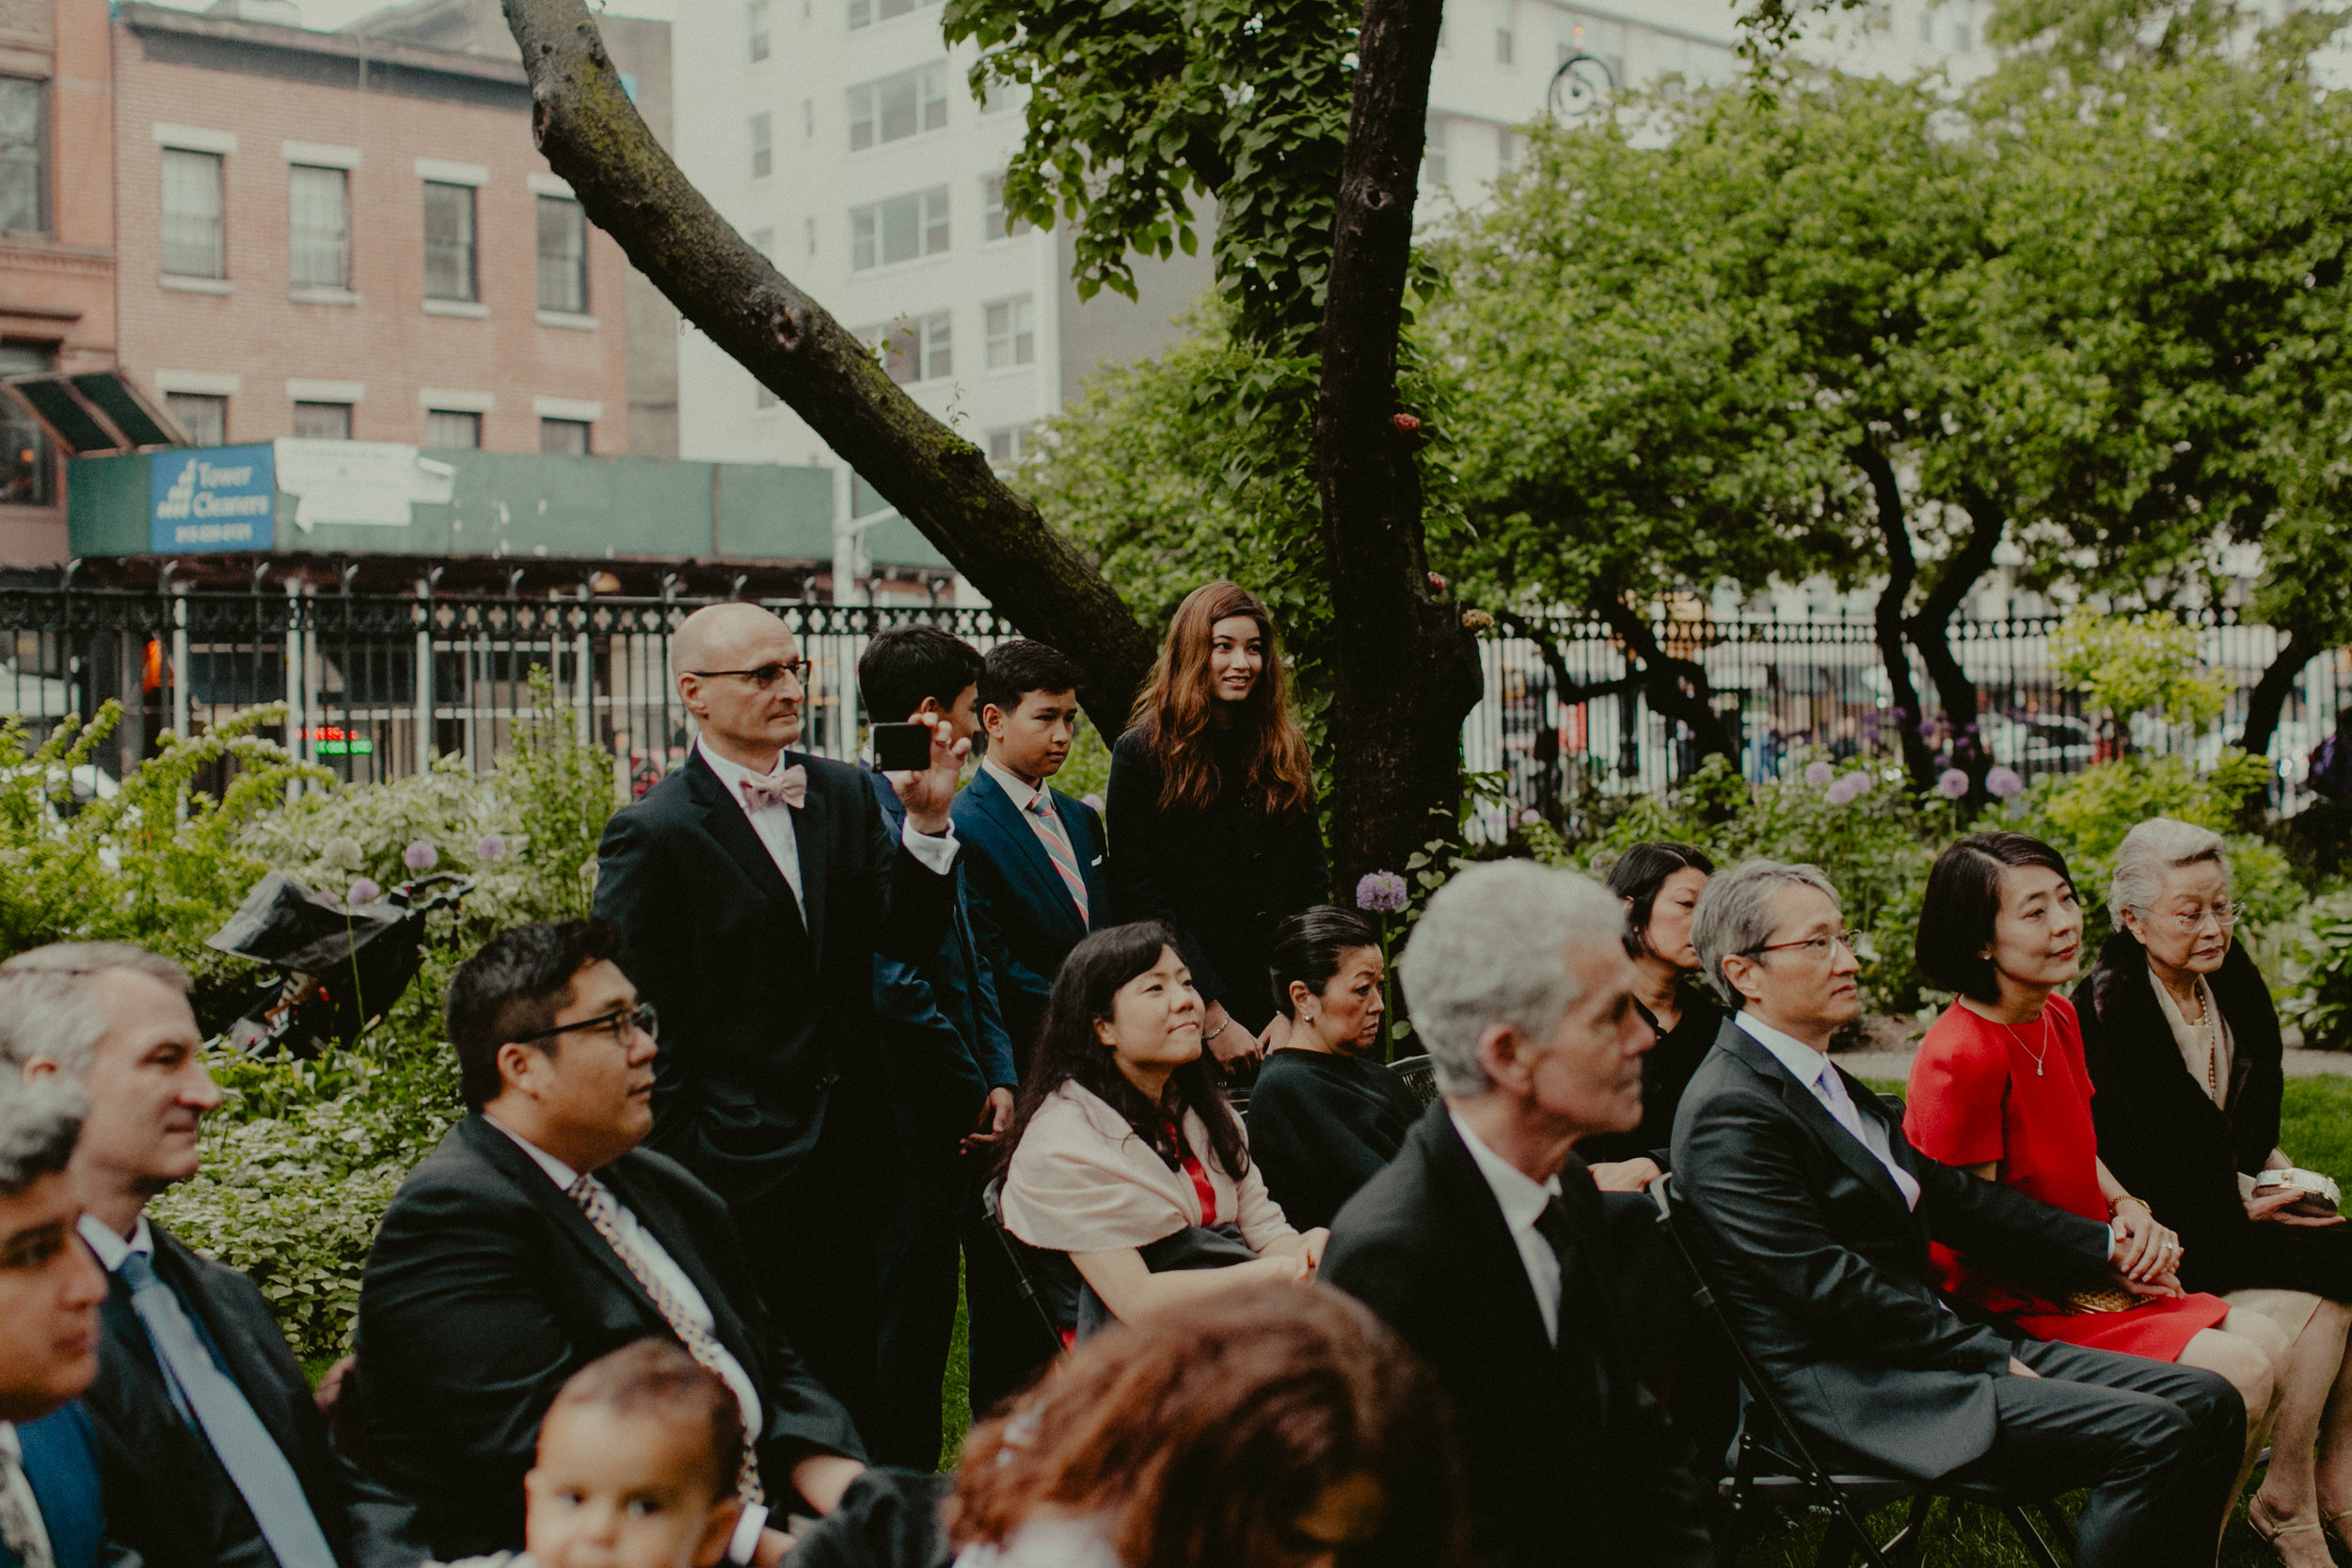 beekman hotel 460jefferson garden market wedding.JPG